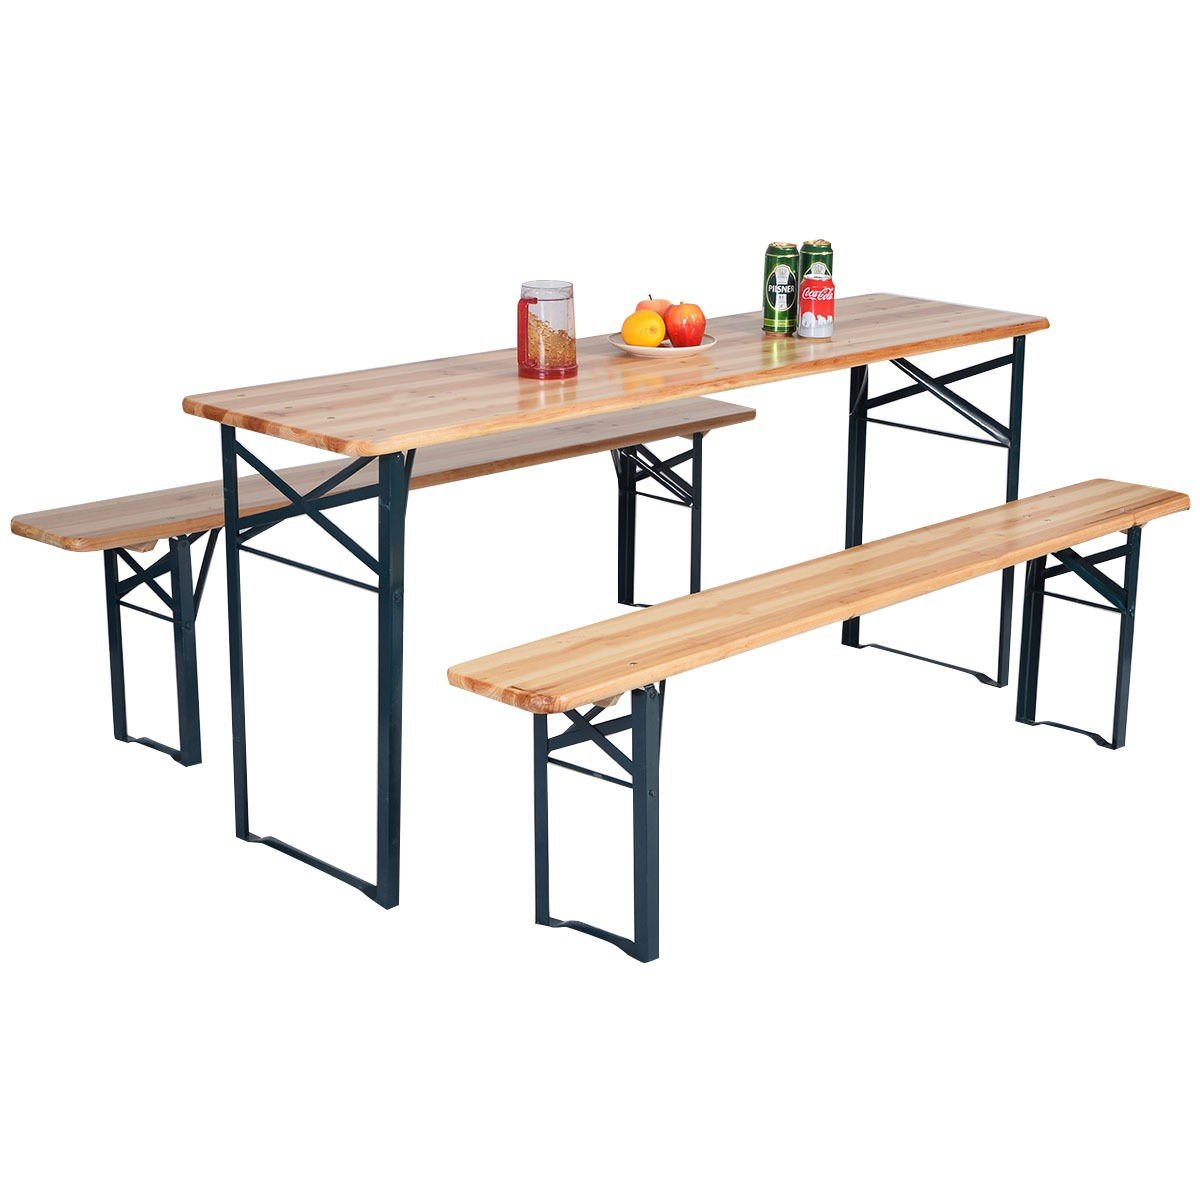 Amazon.com: 3 PCS Beer Table Bench Set Folding Wooden Top Picnic ...